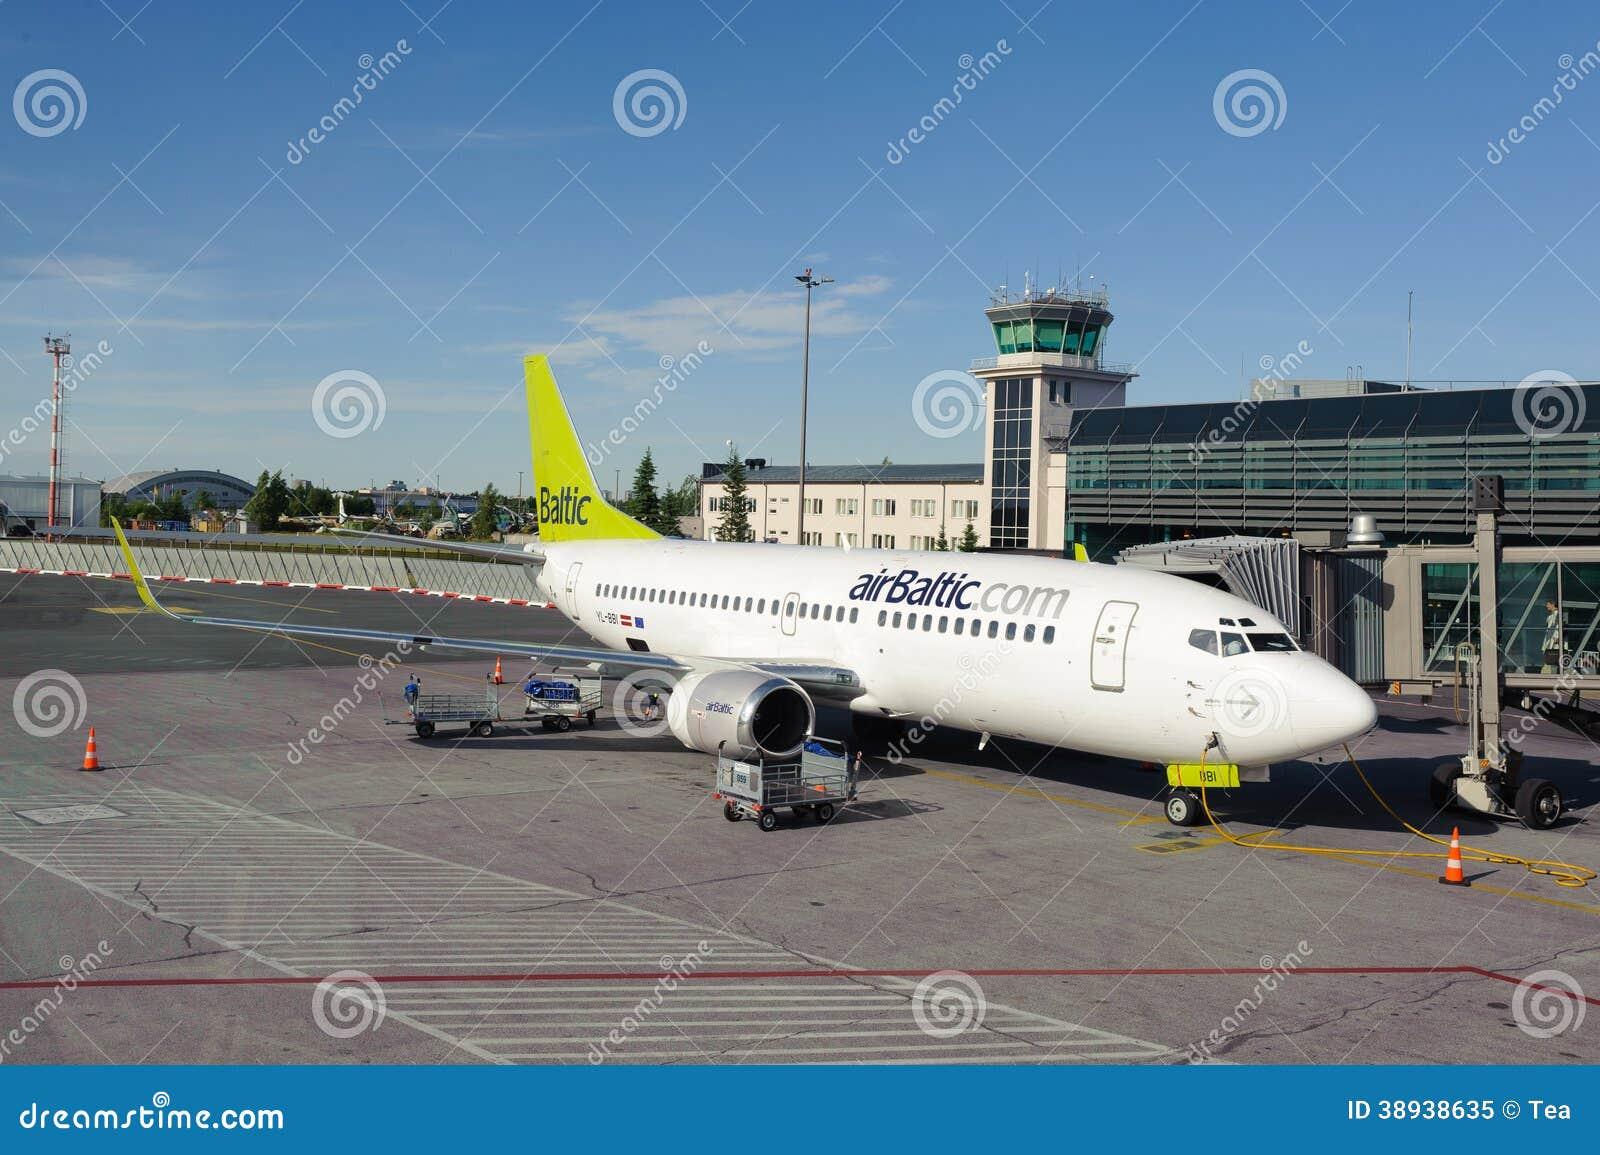 AirBaltic在里加机场靠码头的波音737